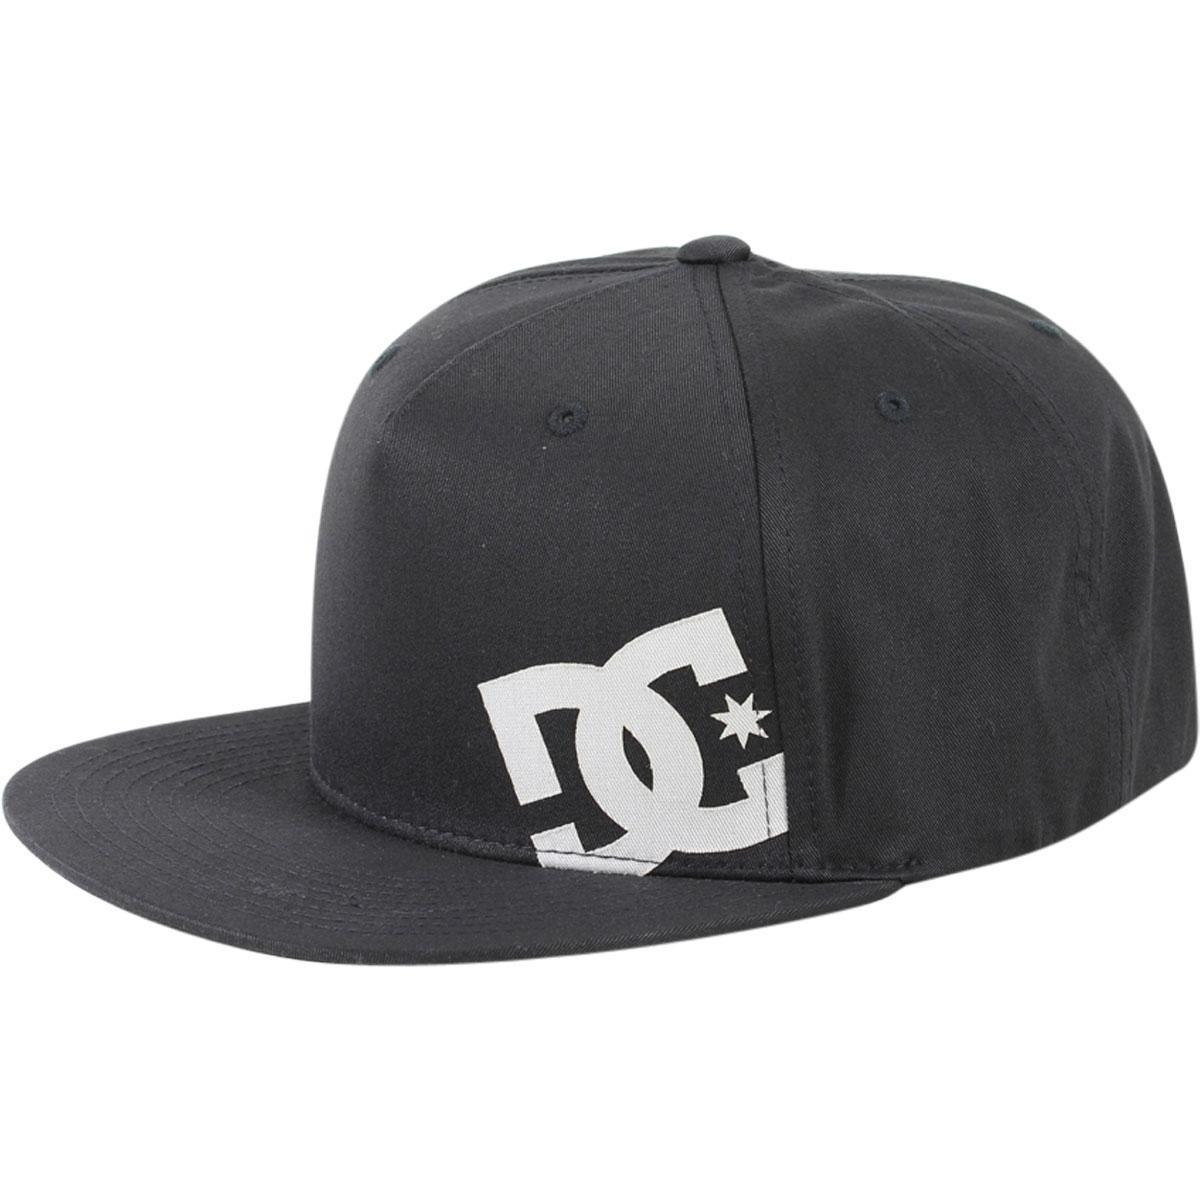 c81ce2e680e DC Shoes Men s Heard-Ya-2 Snapback Baseball Cap Hat by DC Shoes